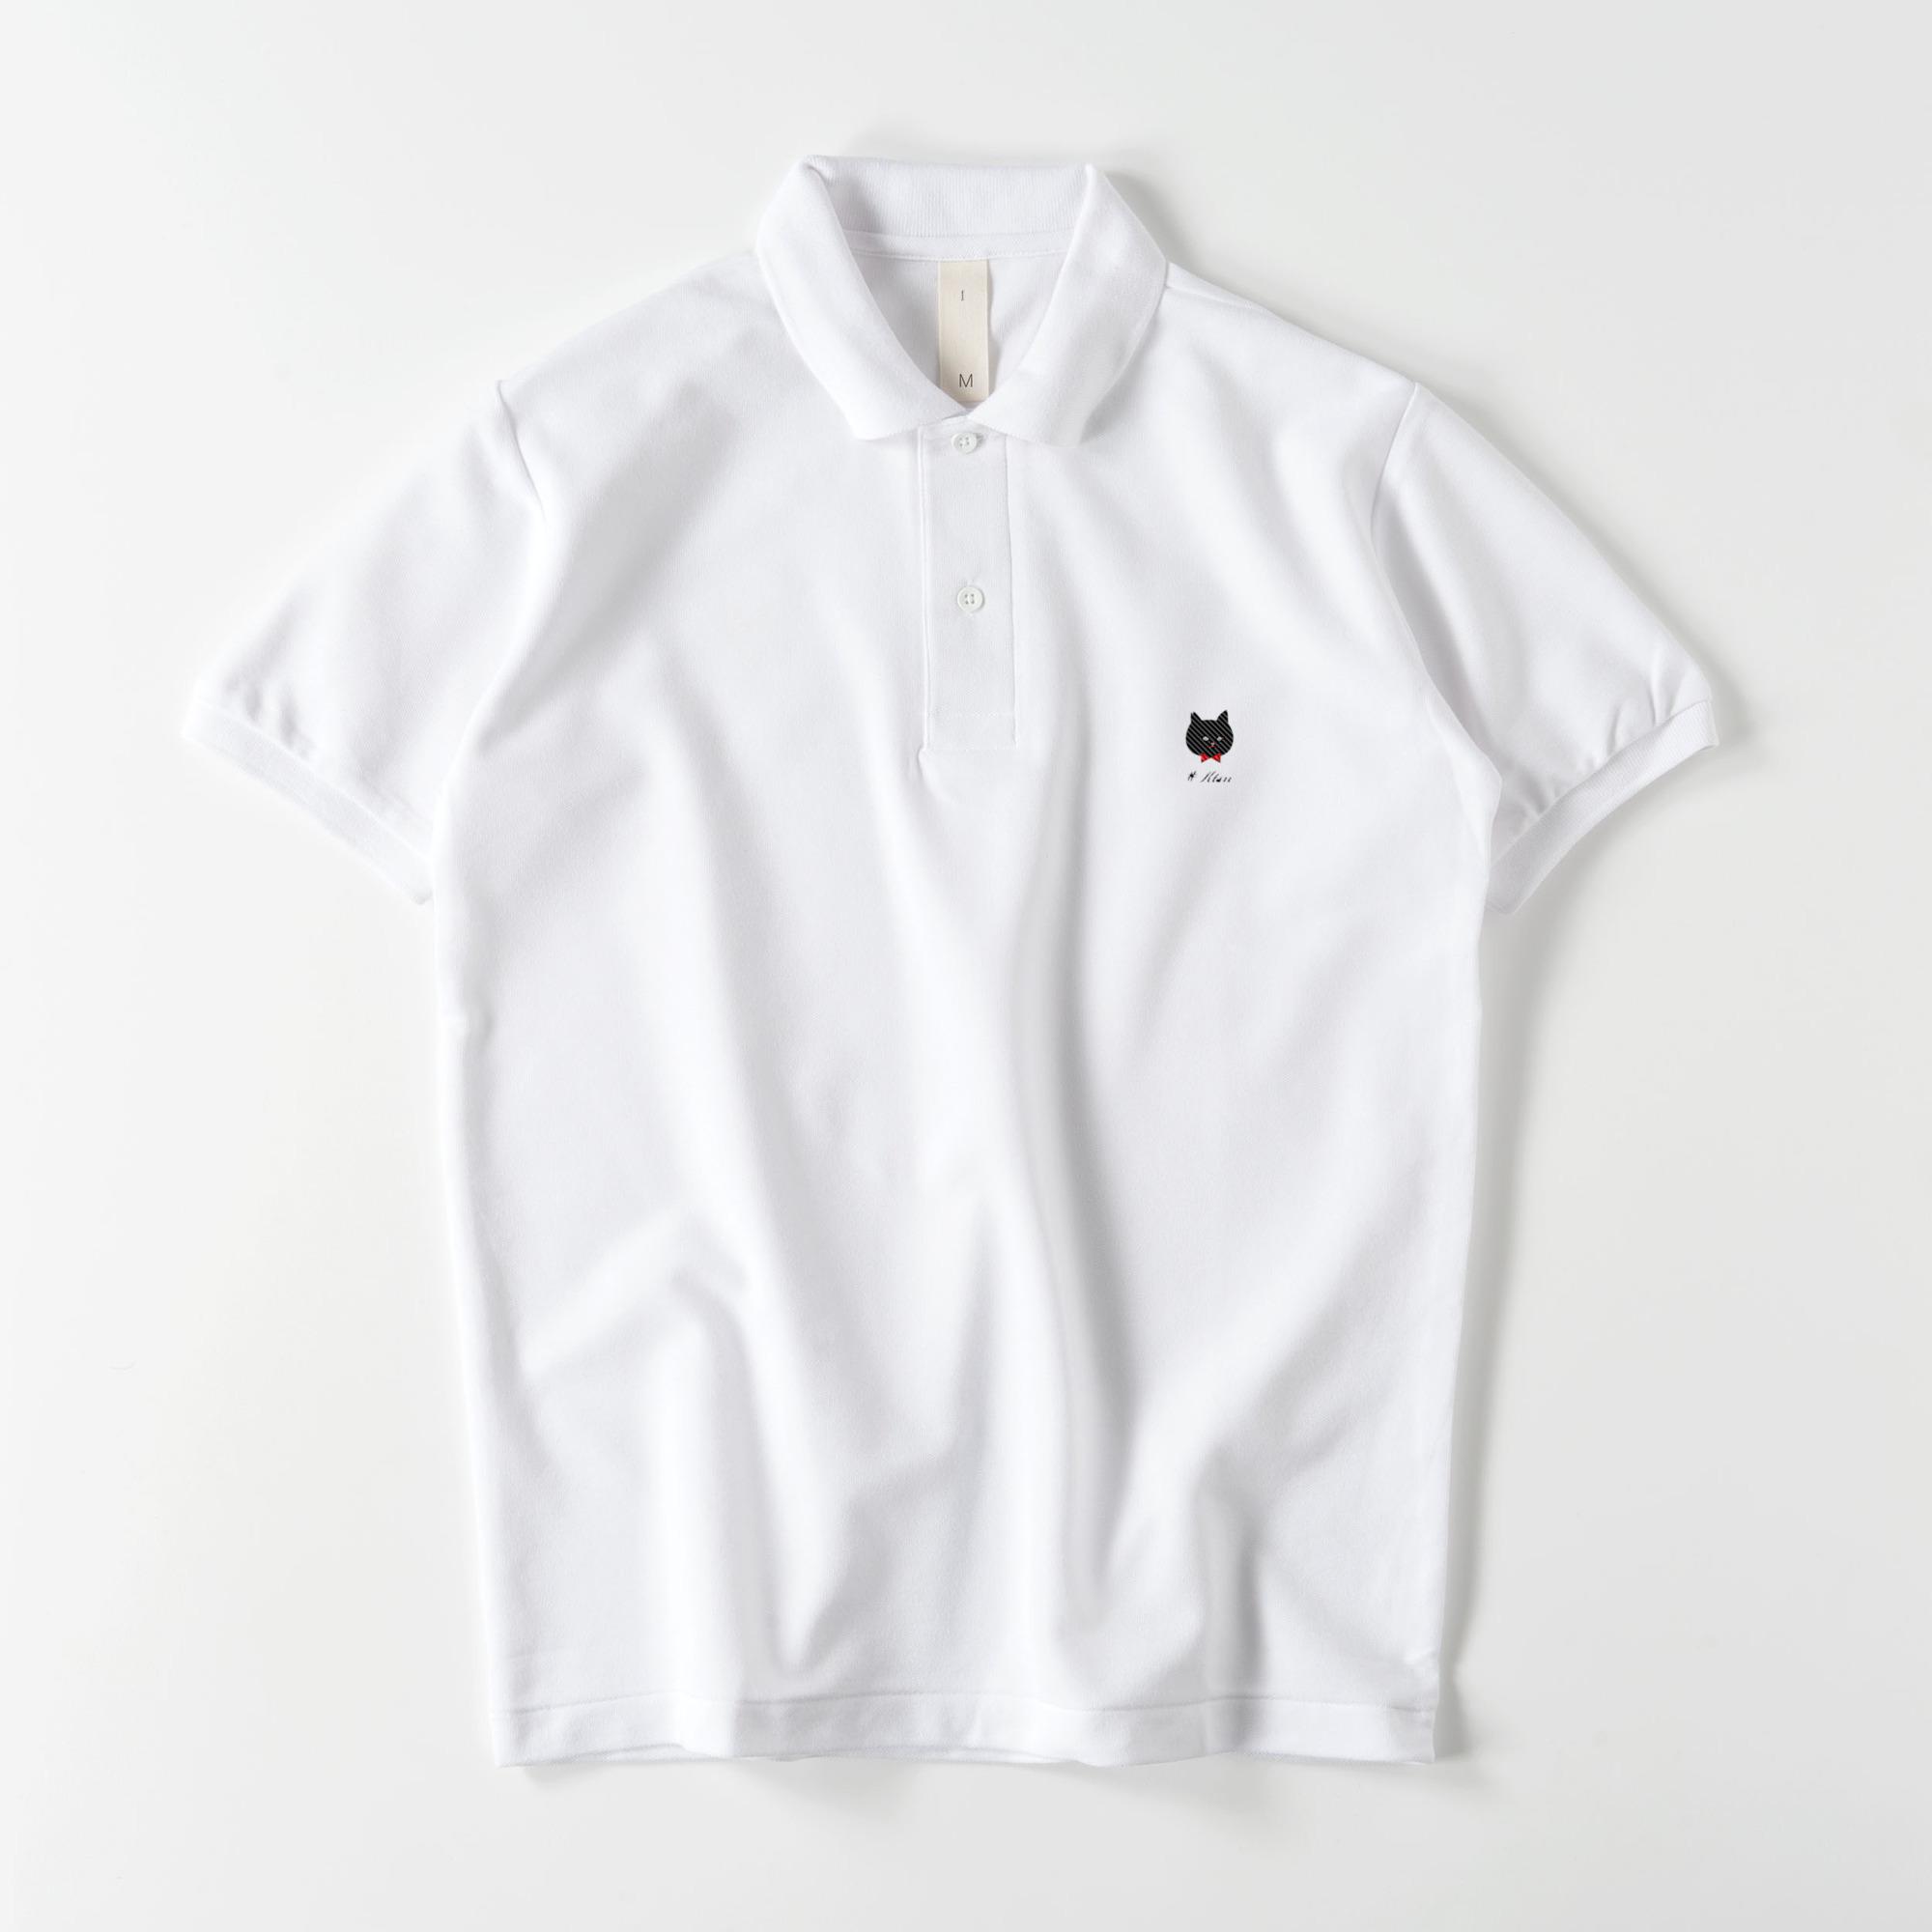 #KTSN×kaco ポロシャツ